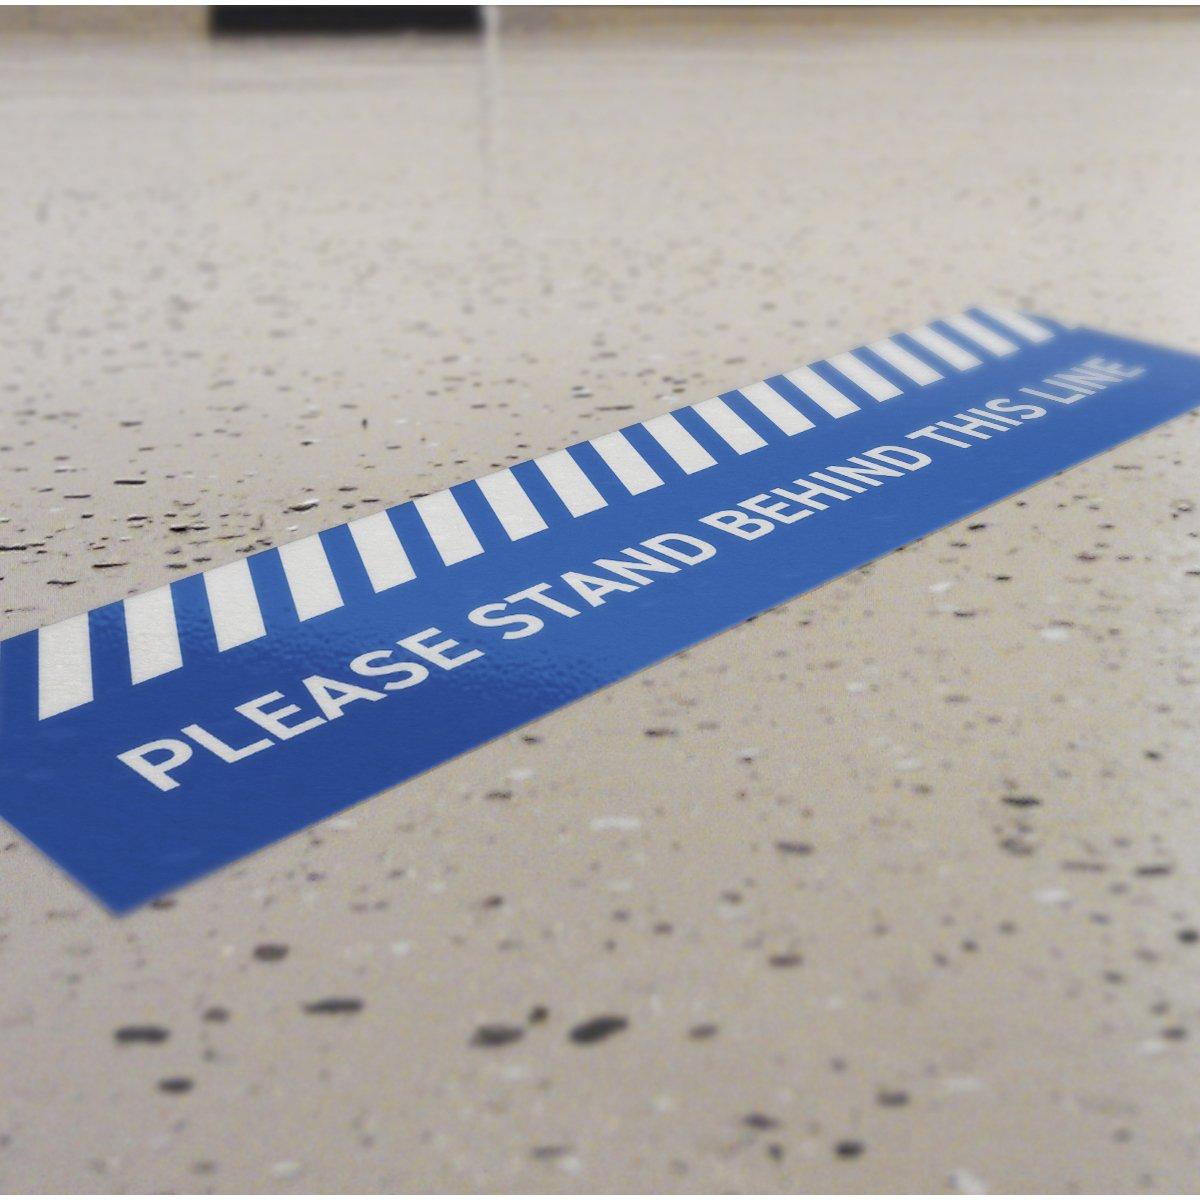 Social Distance Floor Queue Stickers